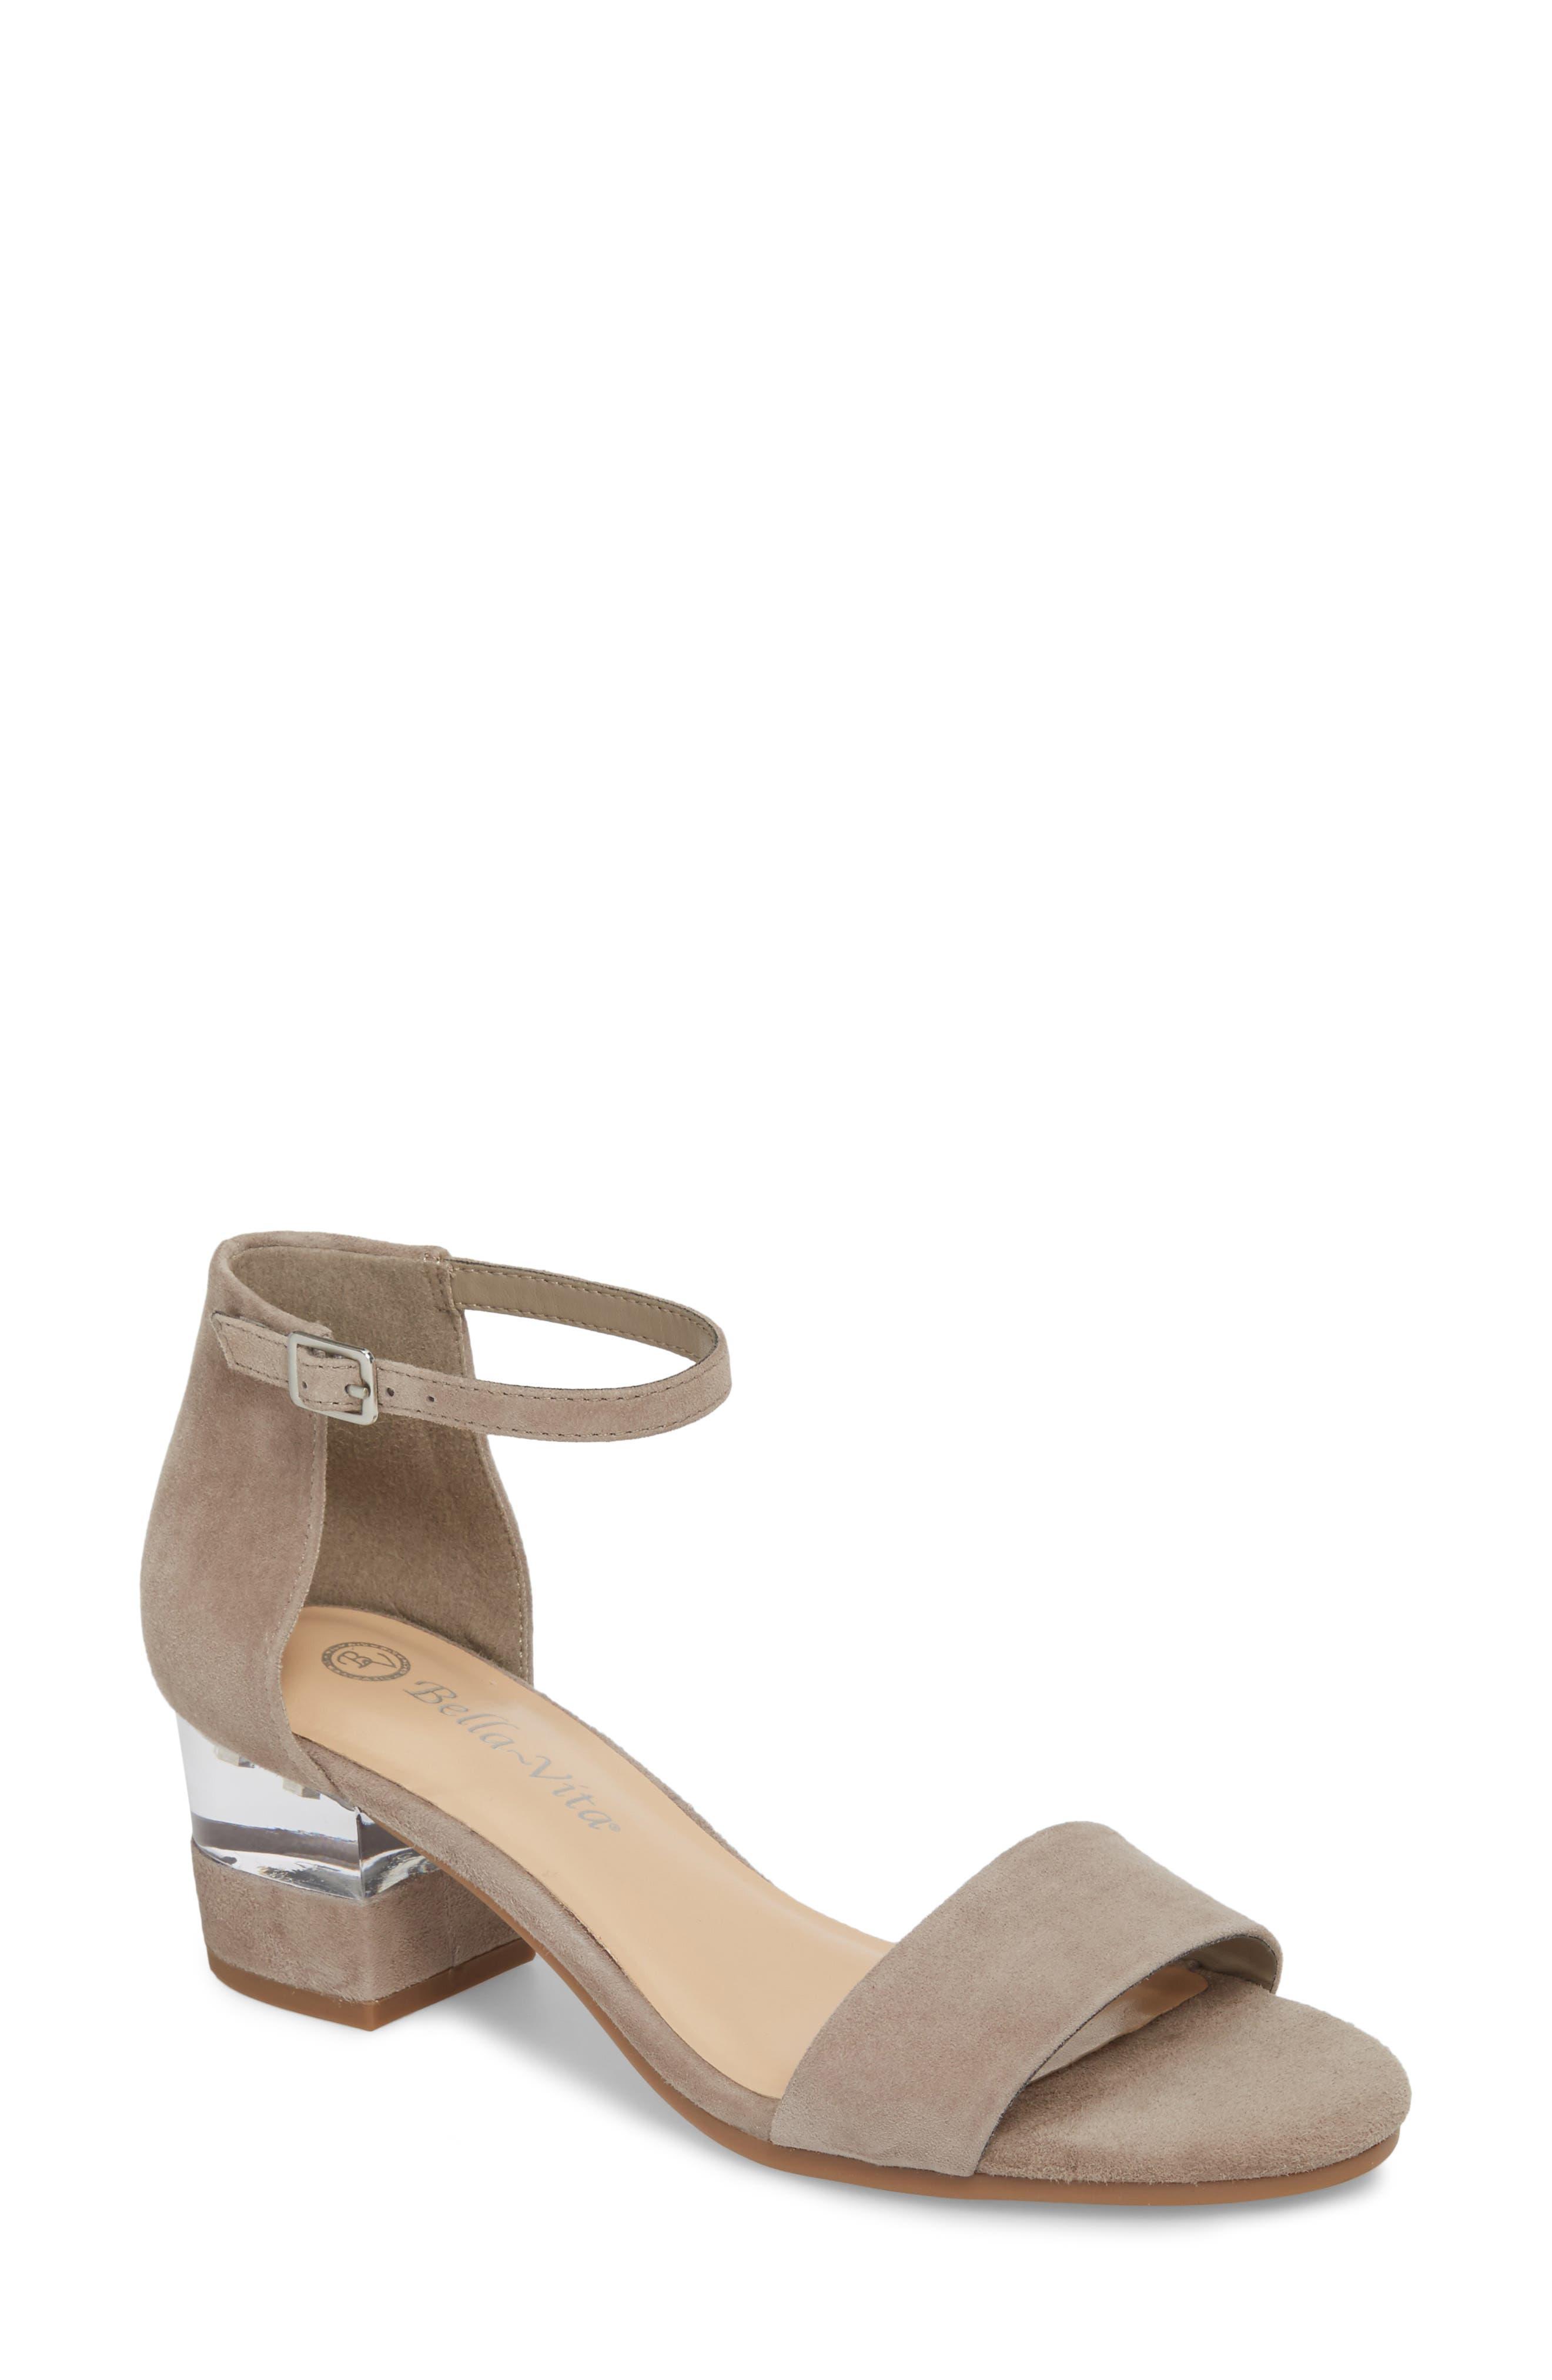 Bella Vita Fitz Block Heel Sandal, WW - Grey